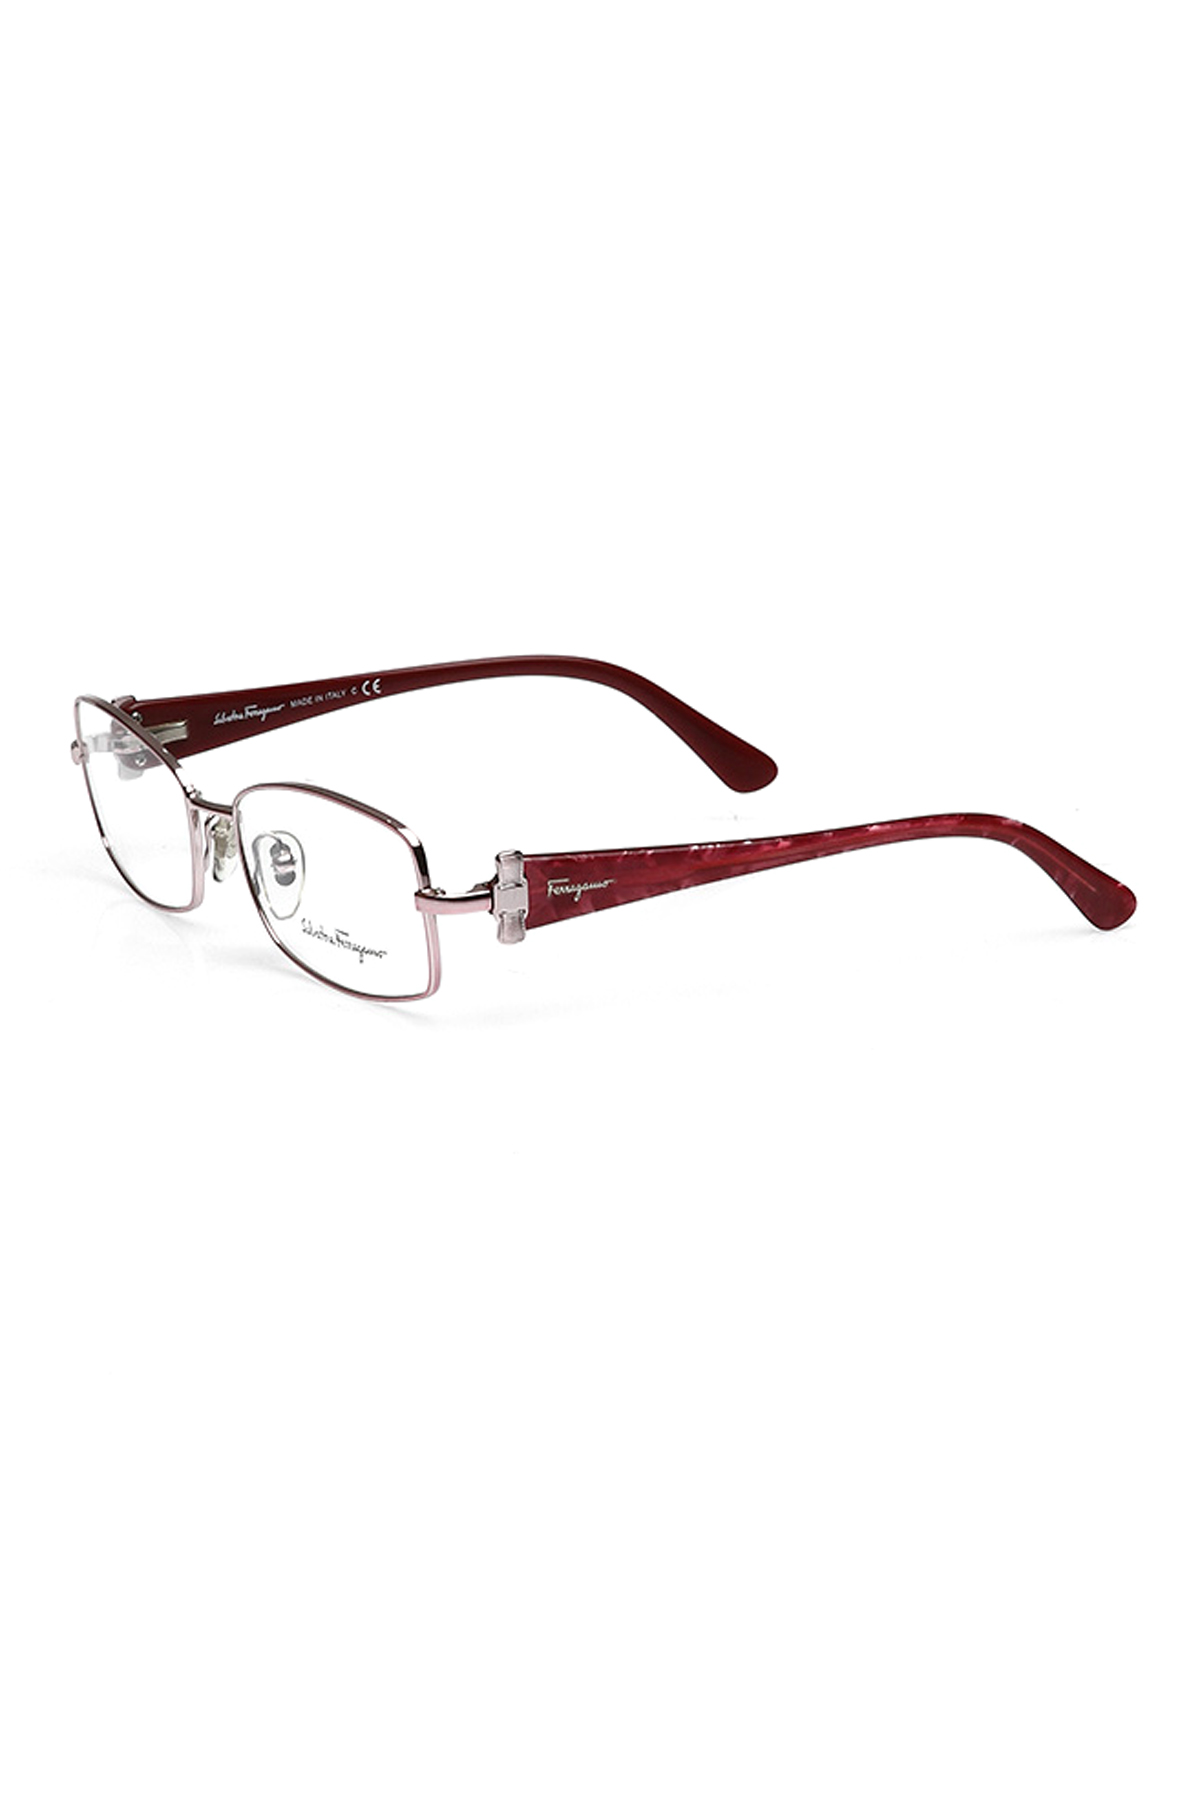 Markamilla Women Reading Glasses Frame Demo Glasses Eyewear Transparent High Quality WomenSalvatore Ferragamo SF 1871 611 52